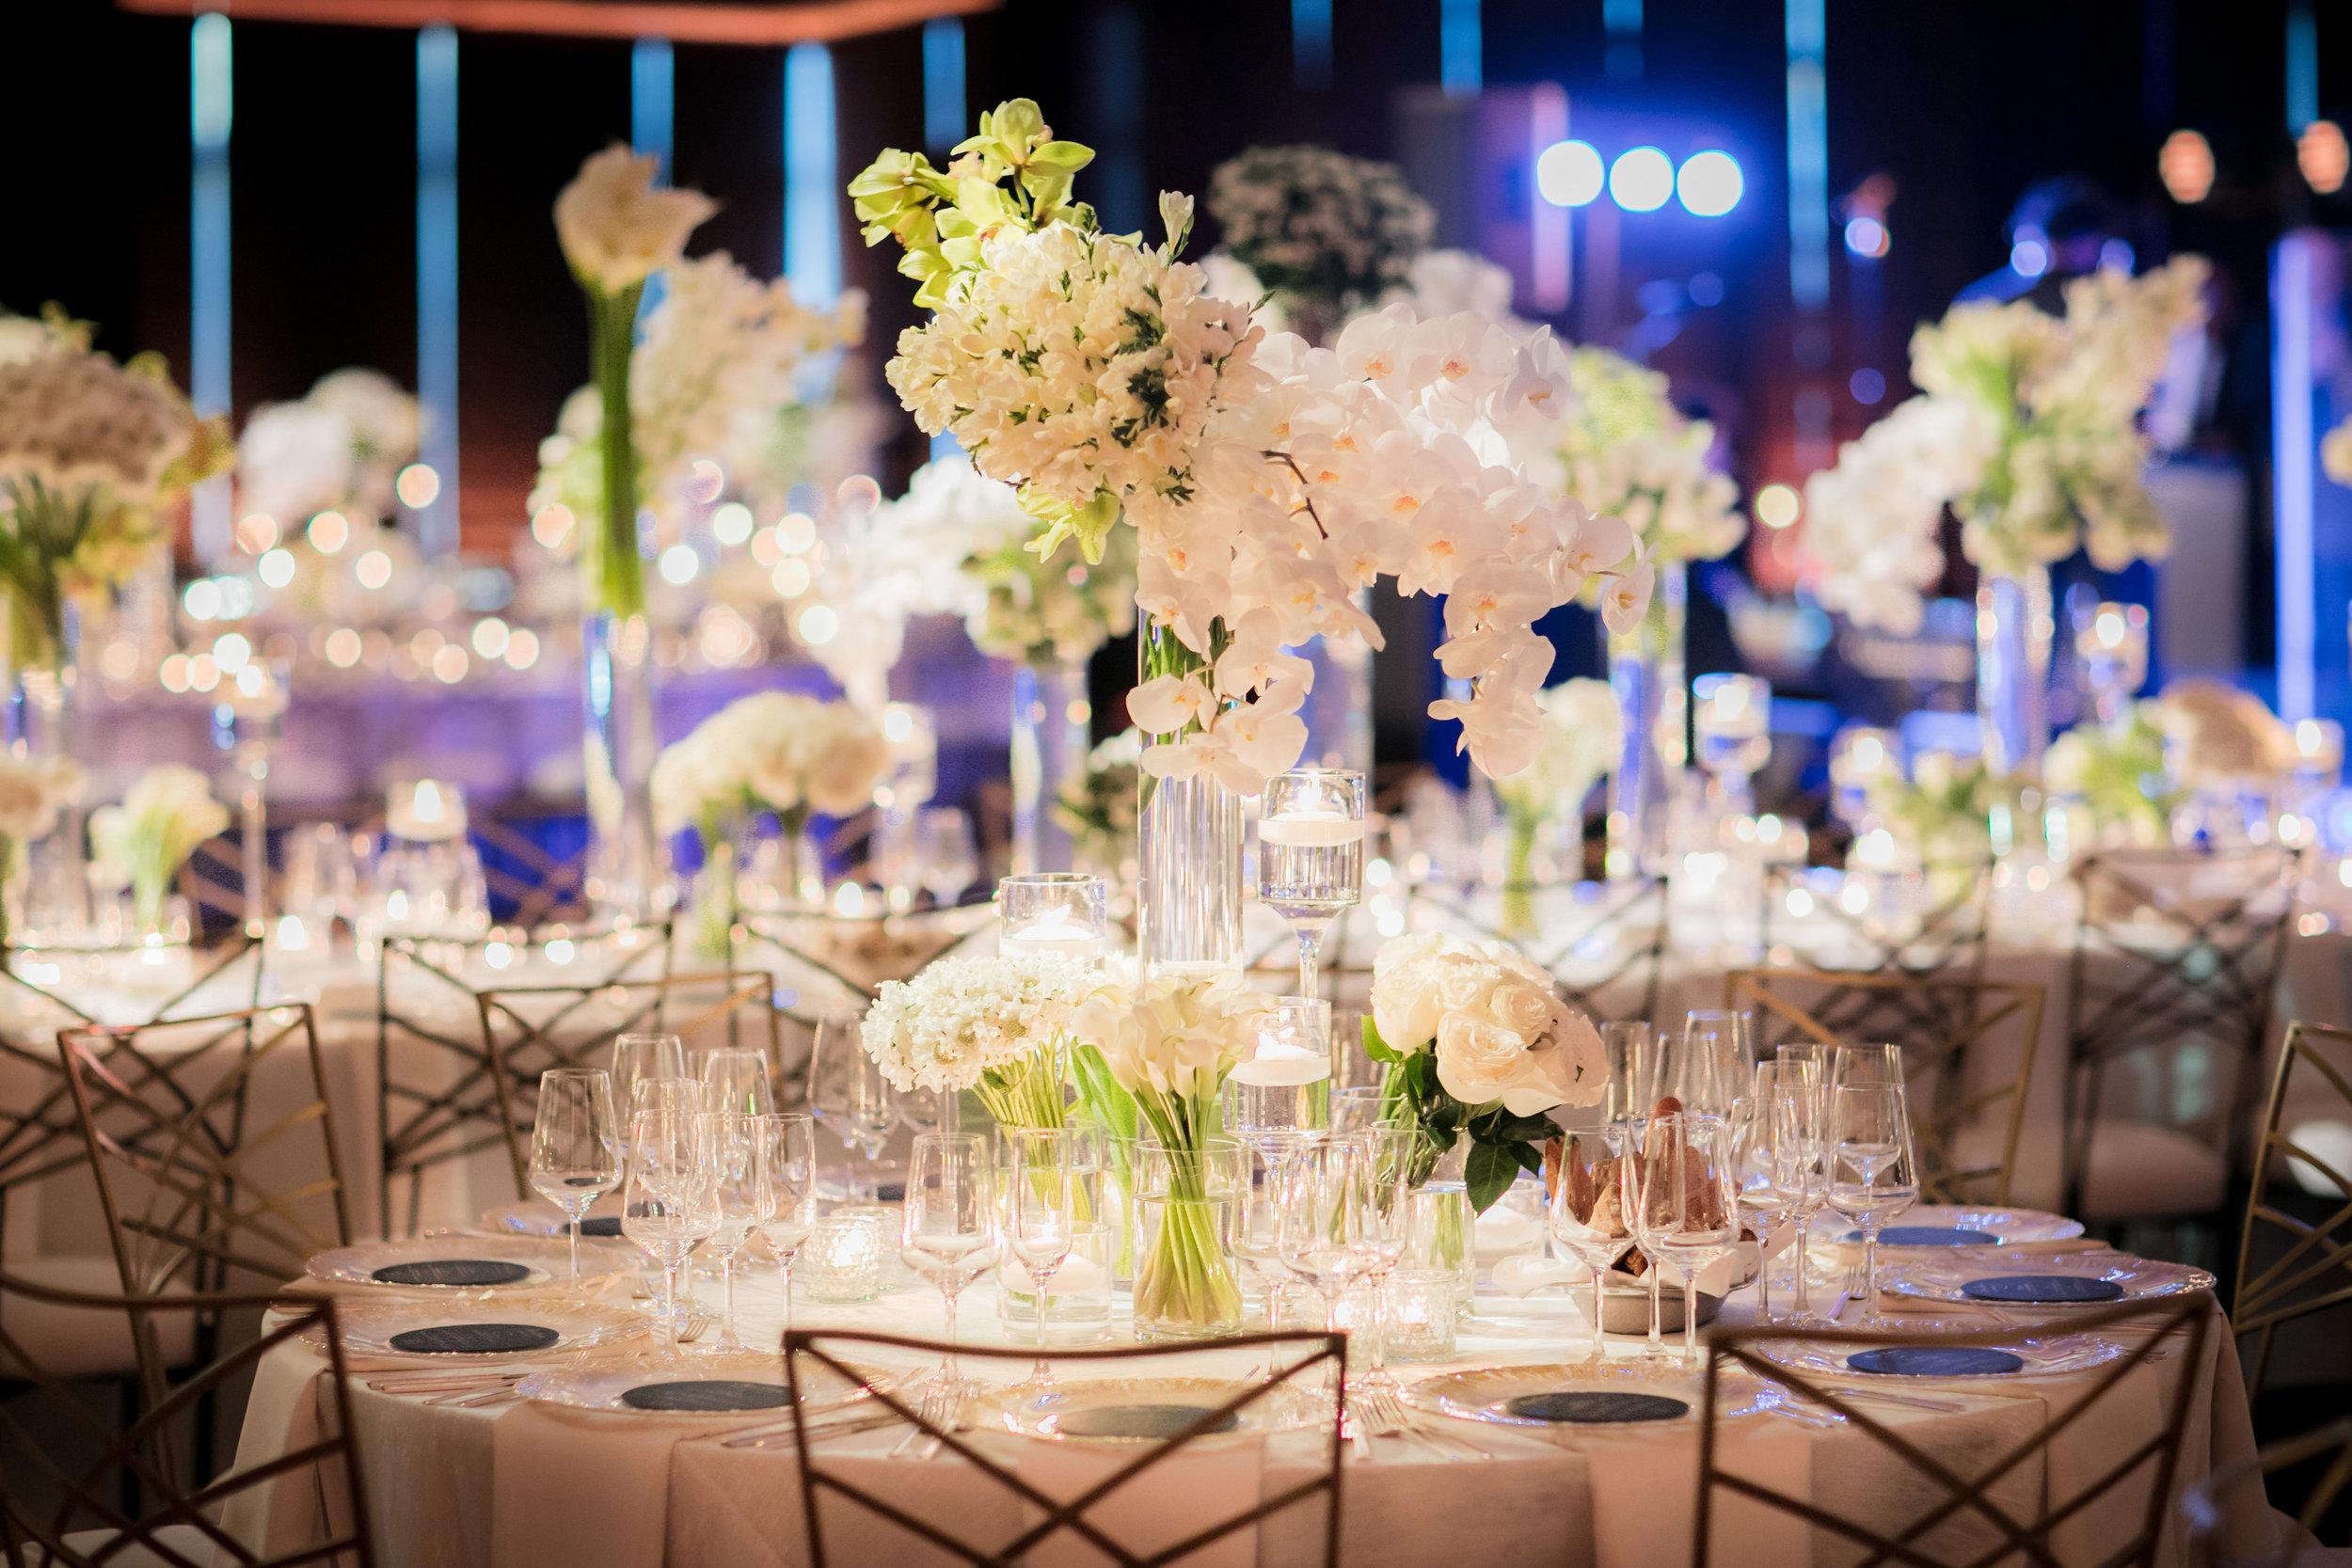 Andrea-Freeman-Events-NY-Wedding-Planner-Mandarin-Oriental-Wedding-11.jpg